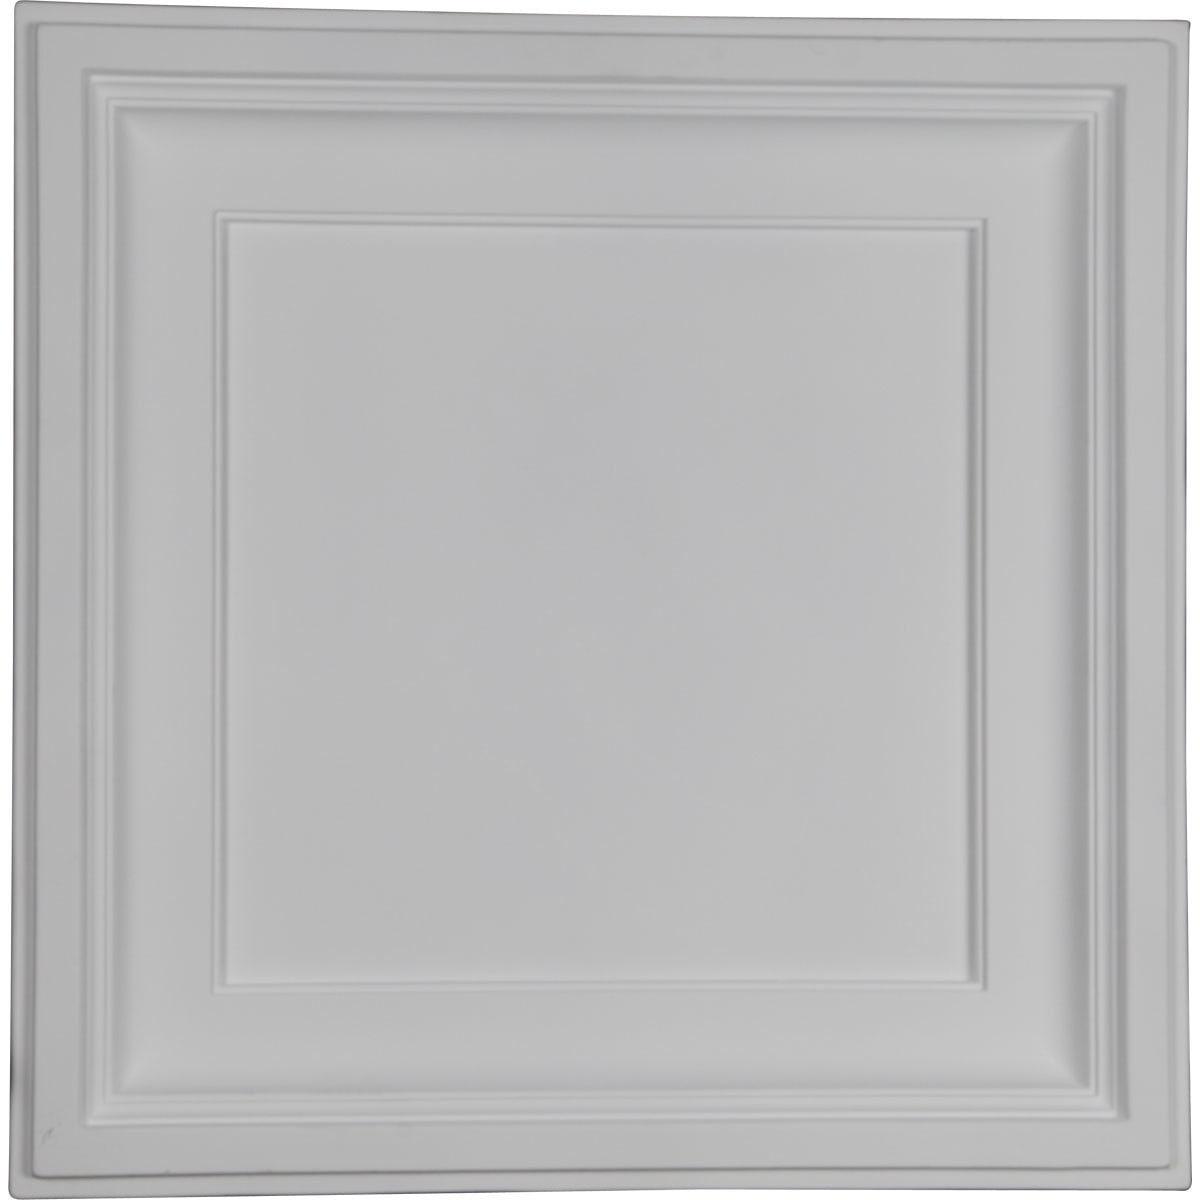 Ekena Millwork - Decorative Polyurethane Ceiling Tiles 150323951